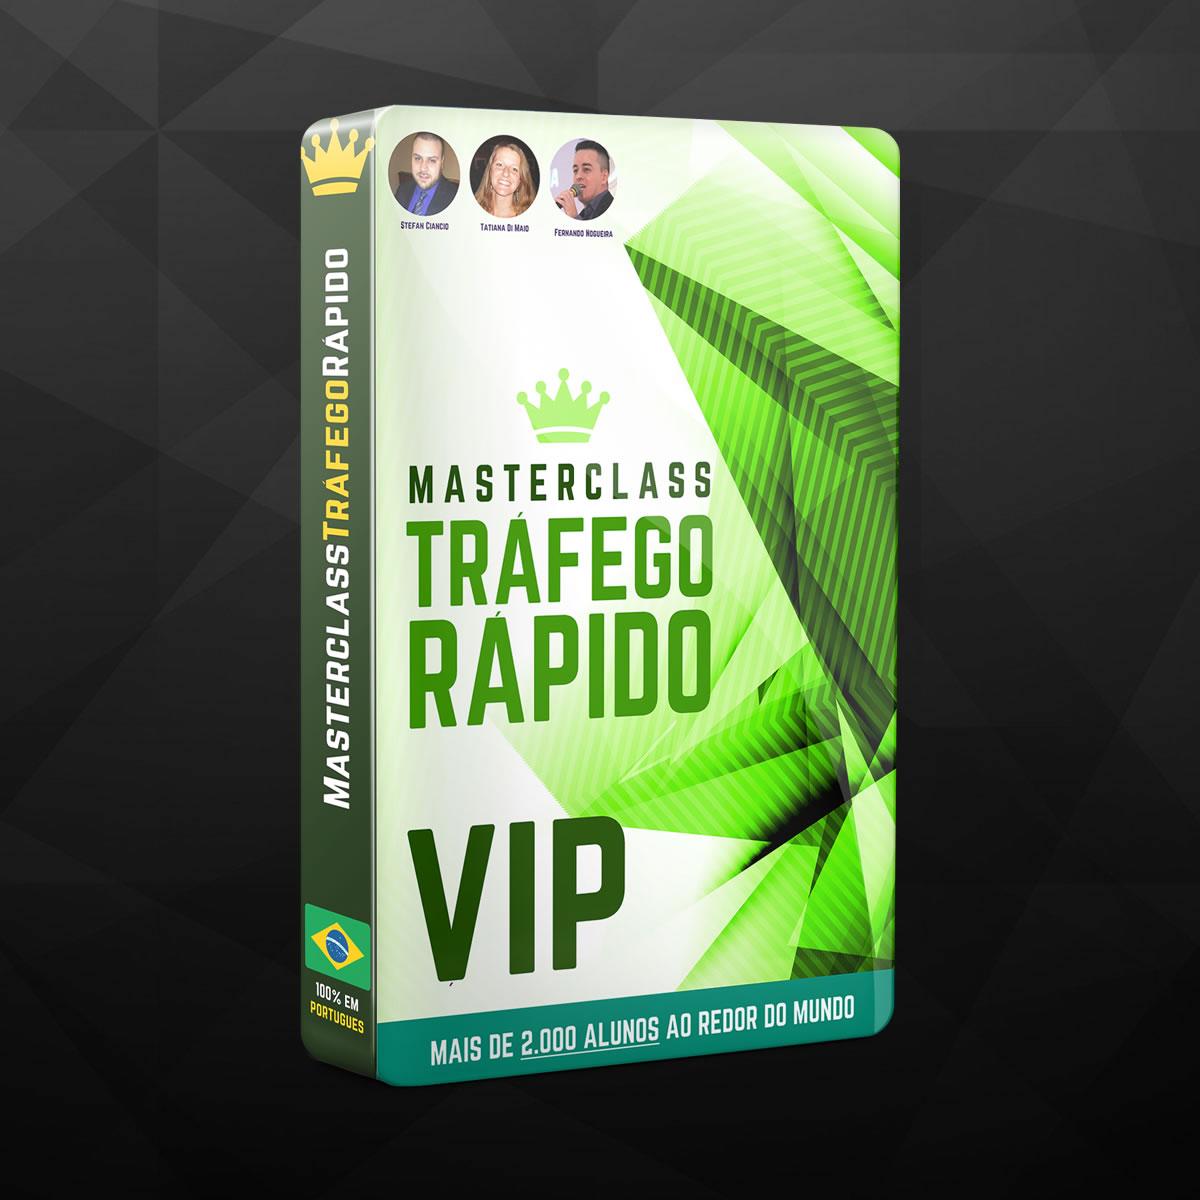 Masterclass Tráfego Rápido - VIP